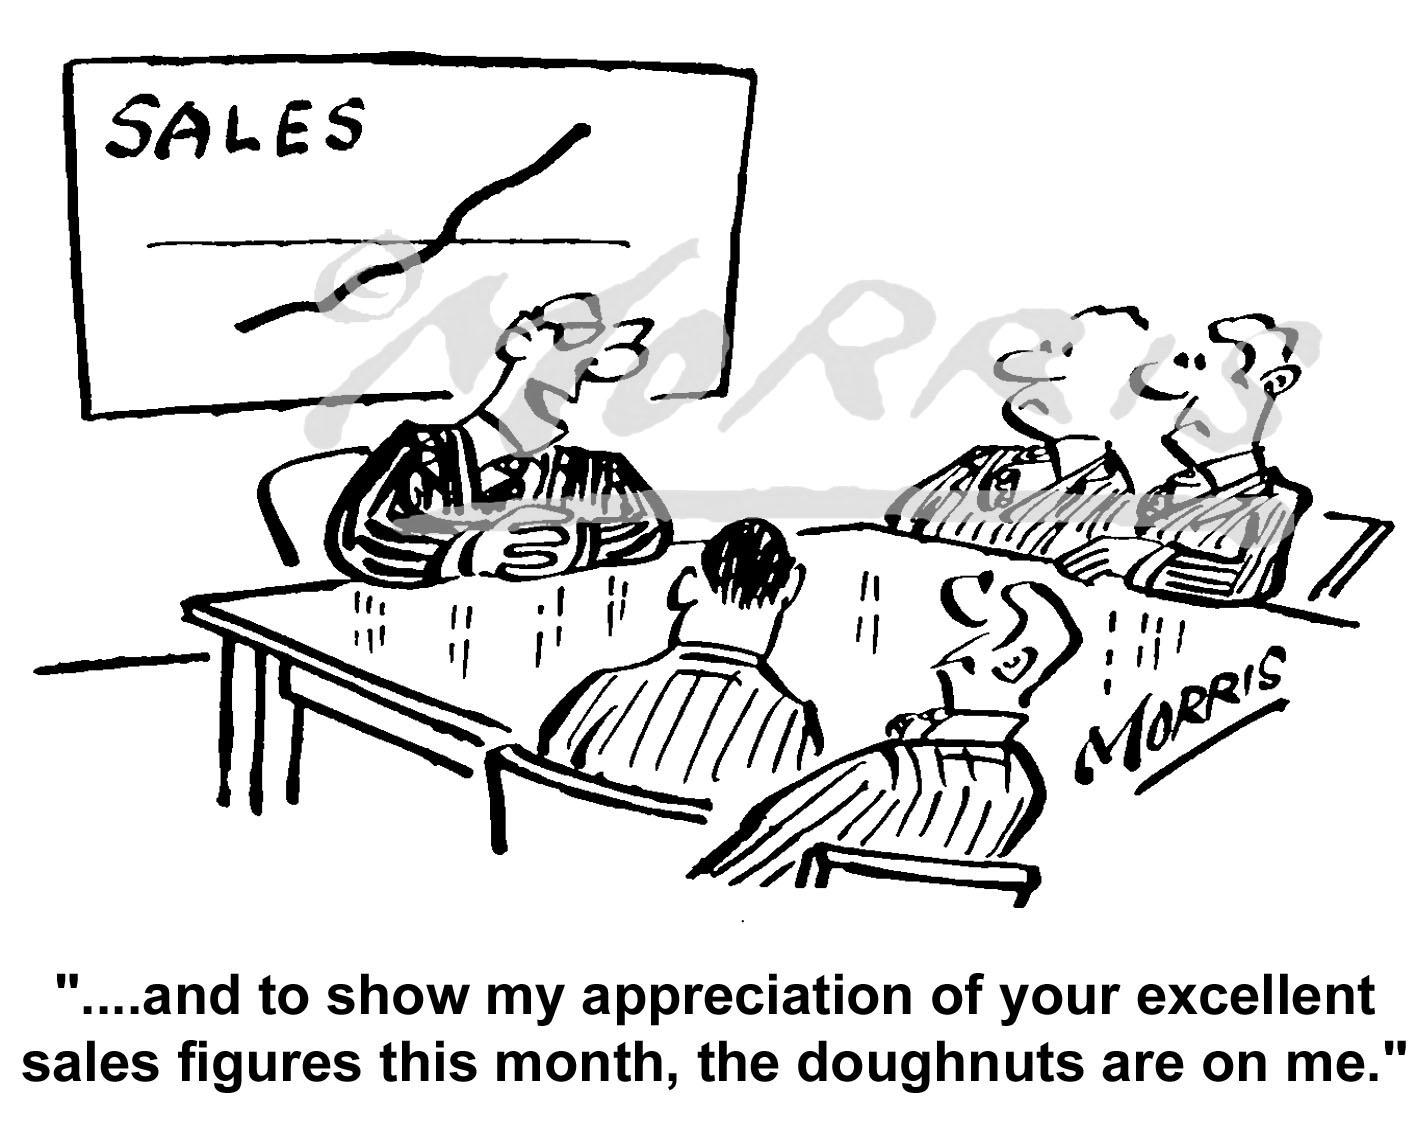 Sales manager cartoon, sales meeting cartoon Ref: 1699bw